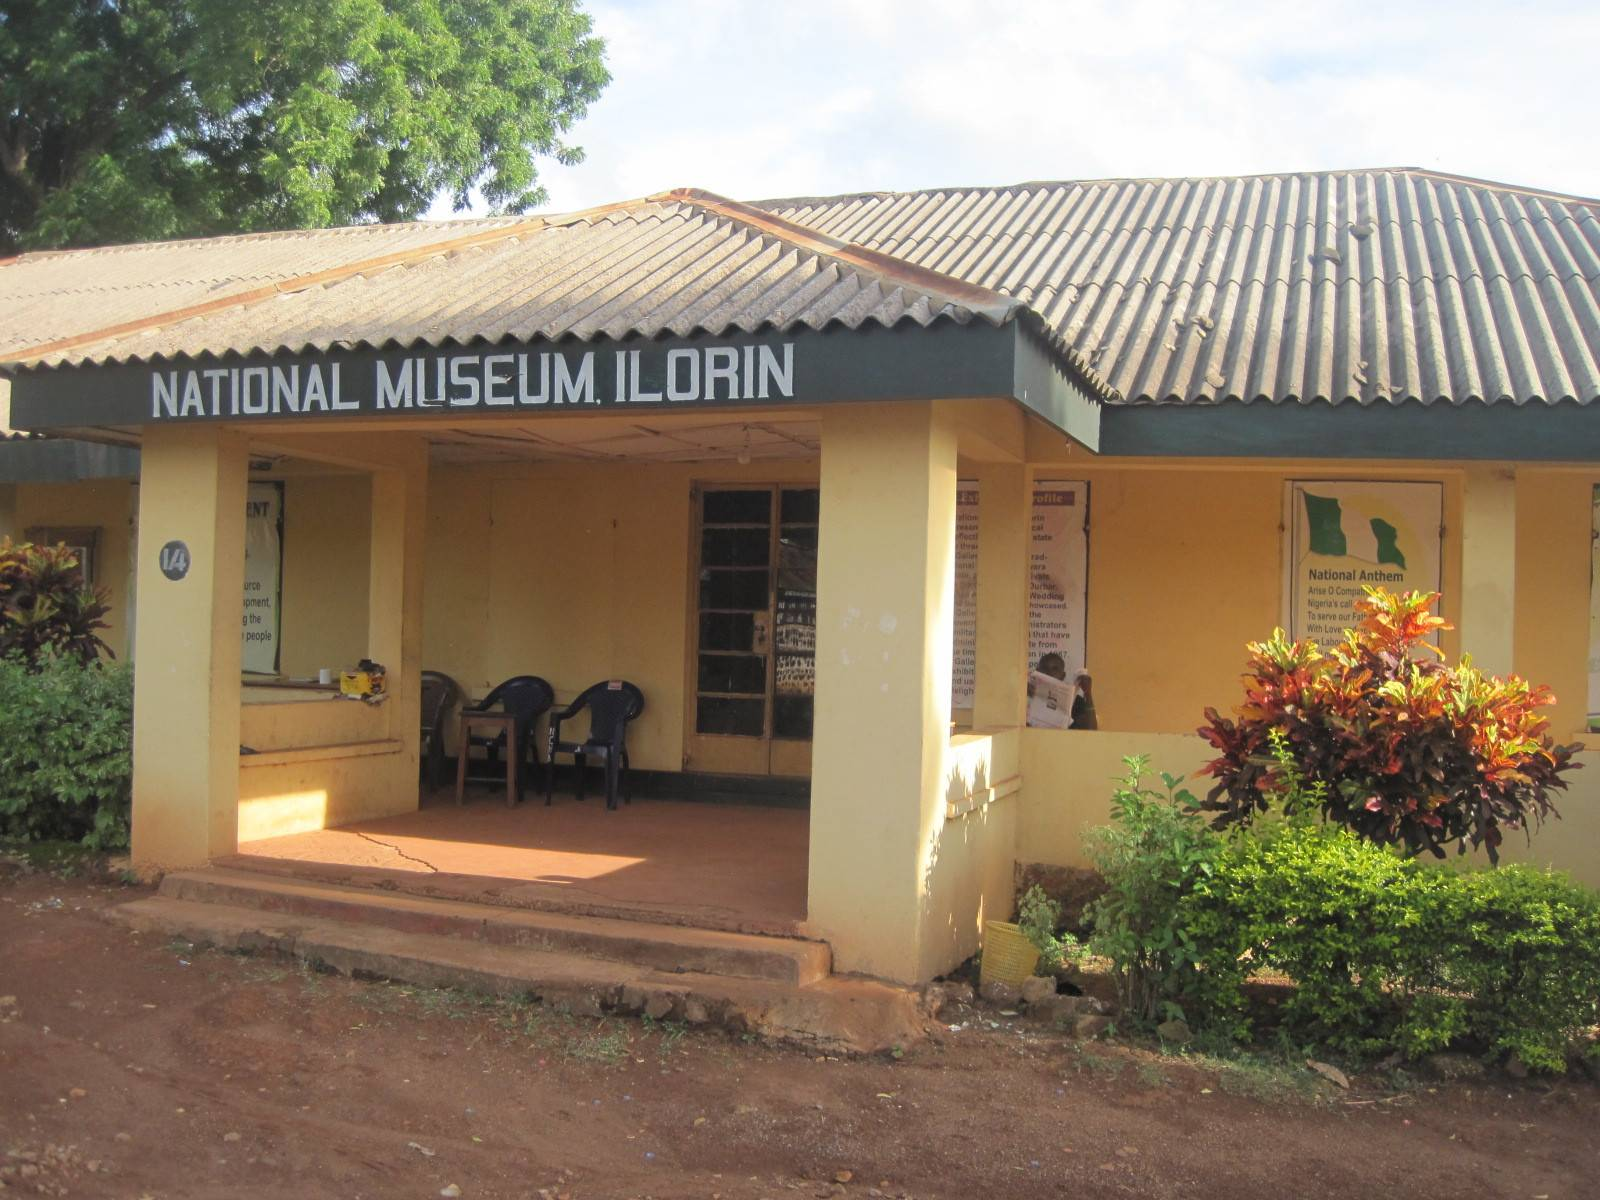 National Museum, Ilorin1